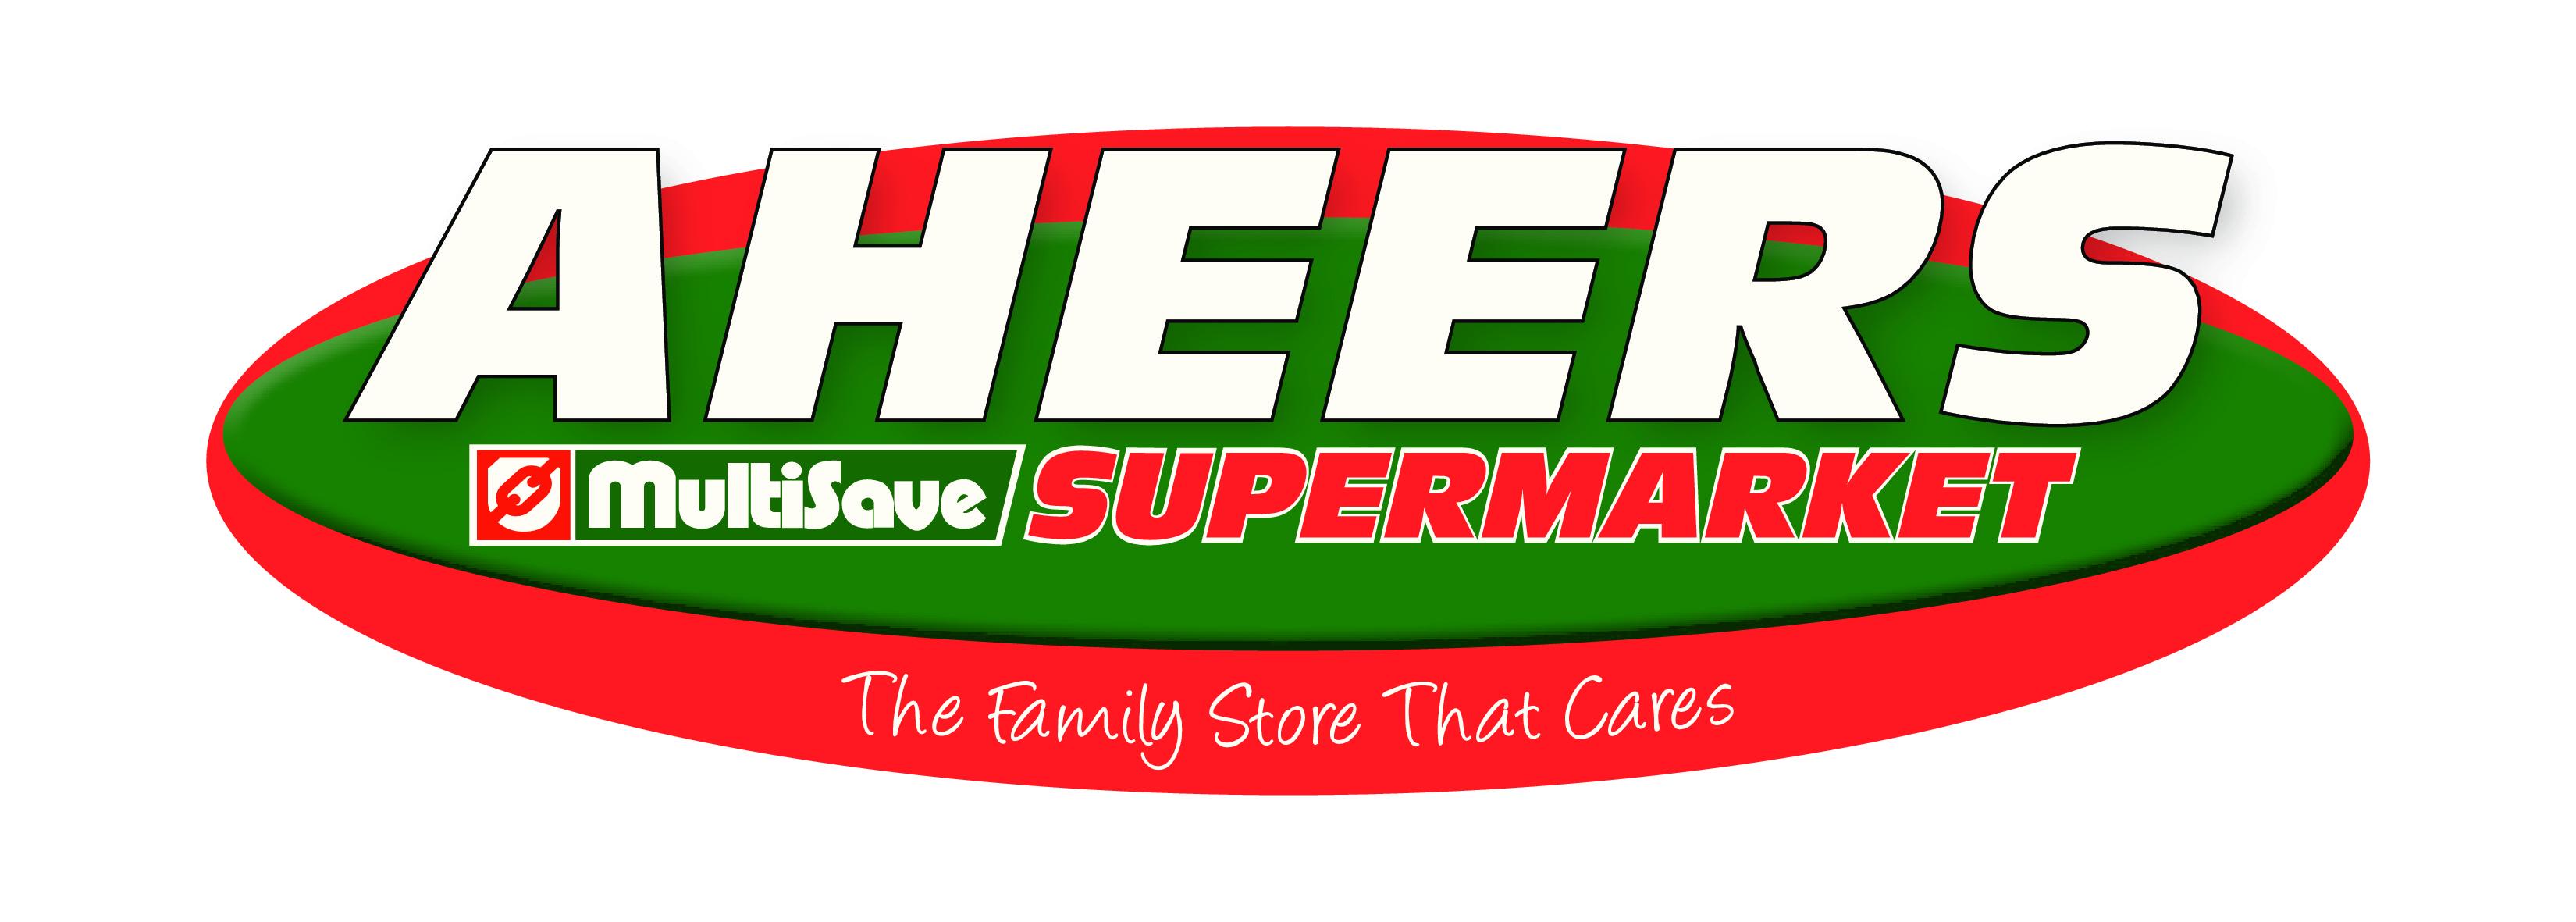 Aheers Supermarket Multisave Logo